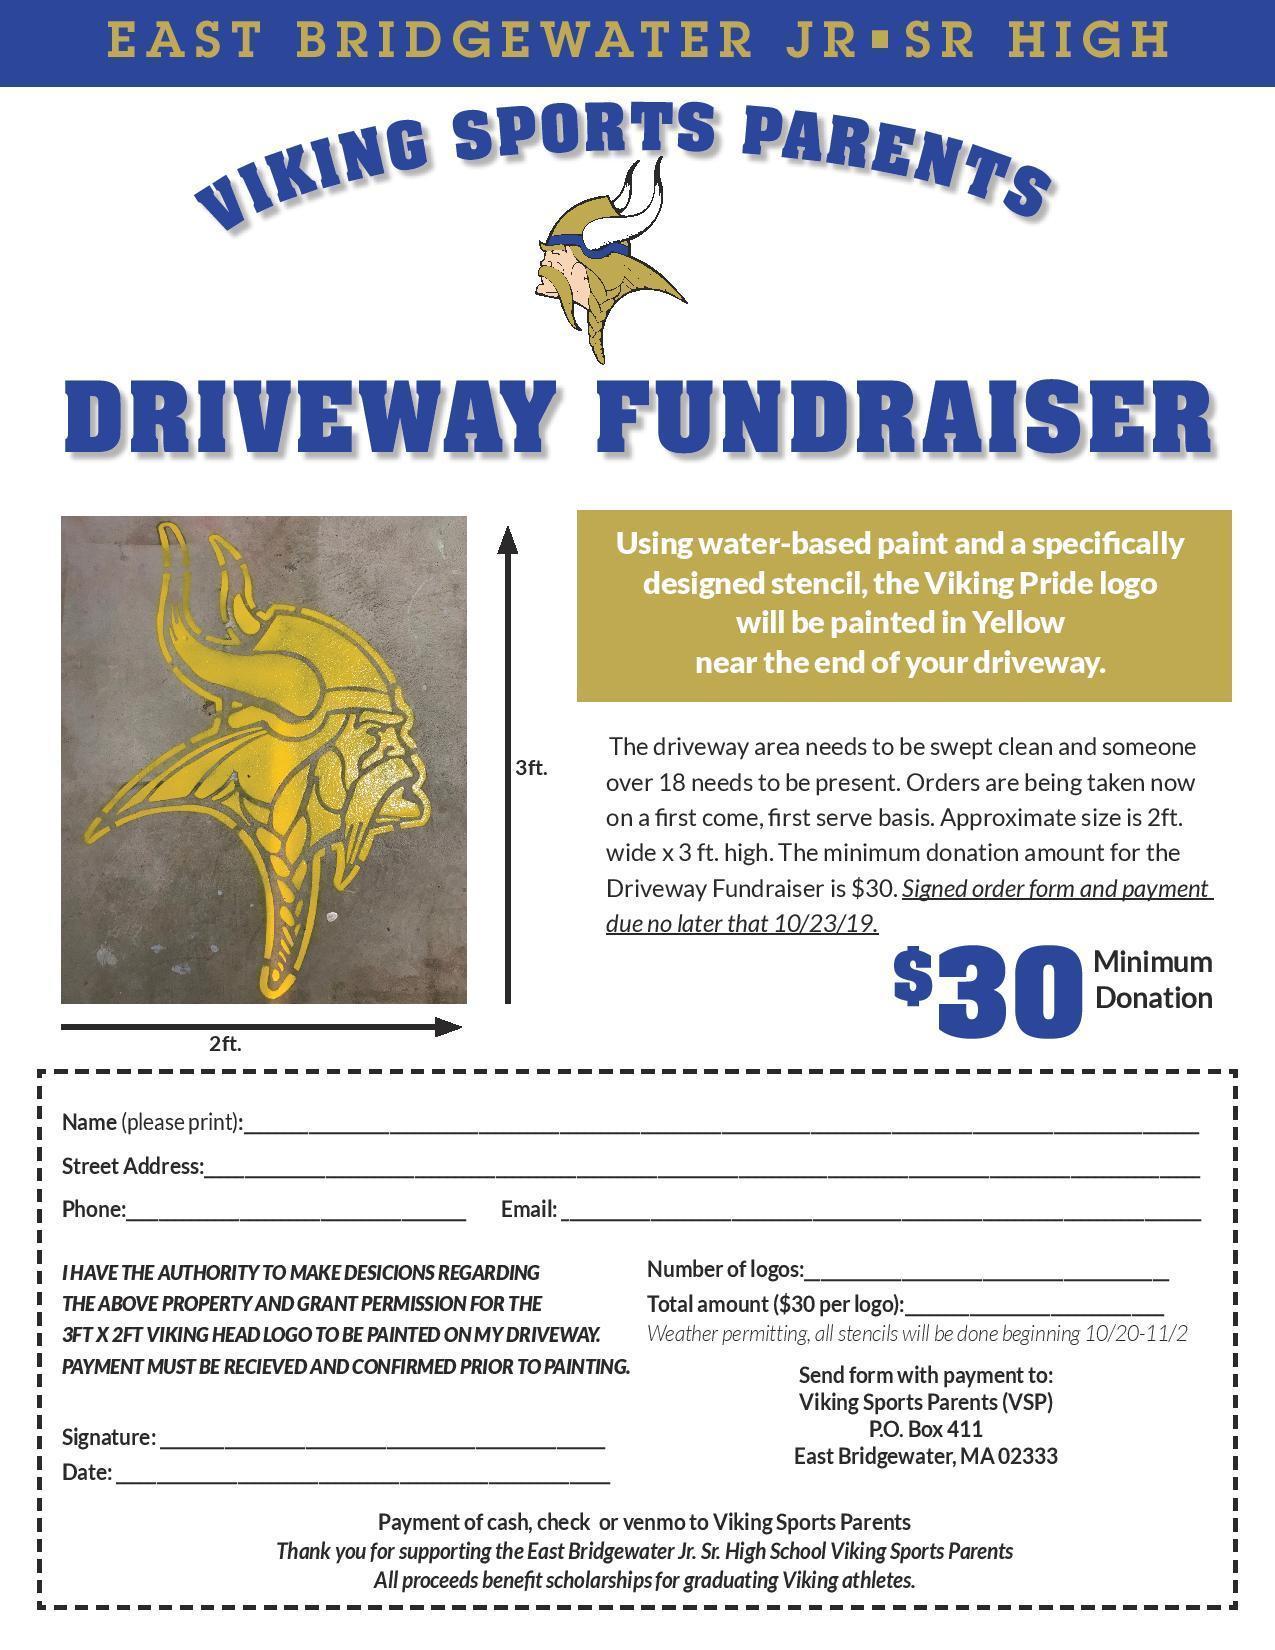 Driveway Fundraiser